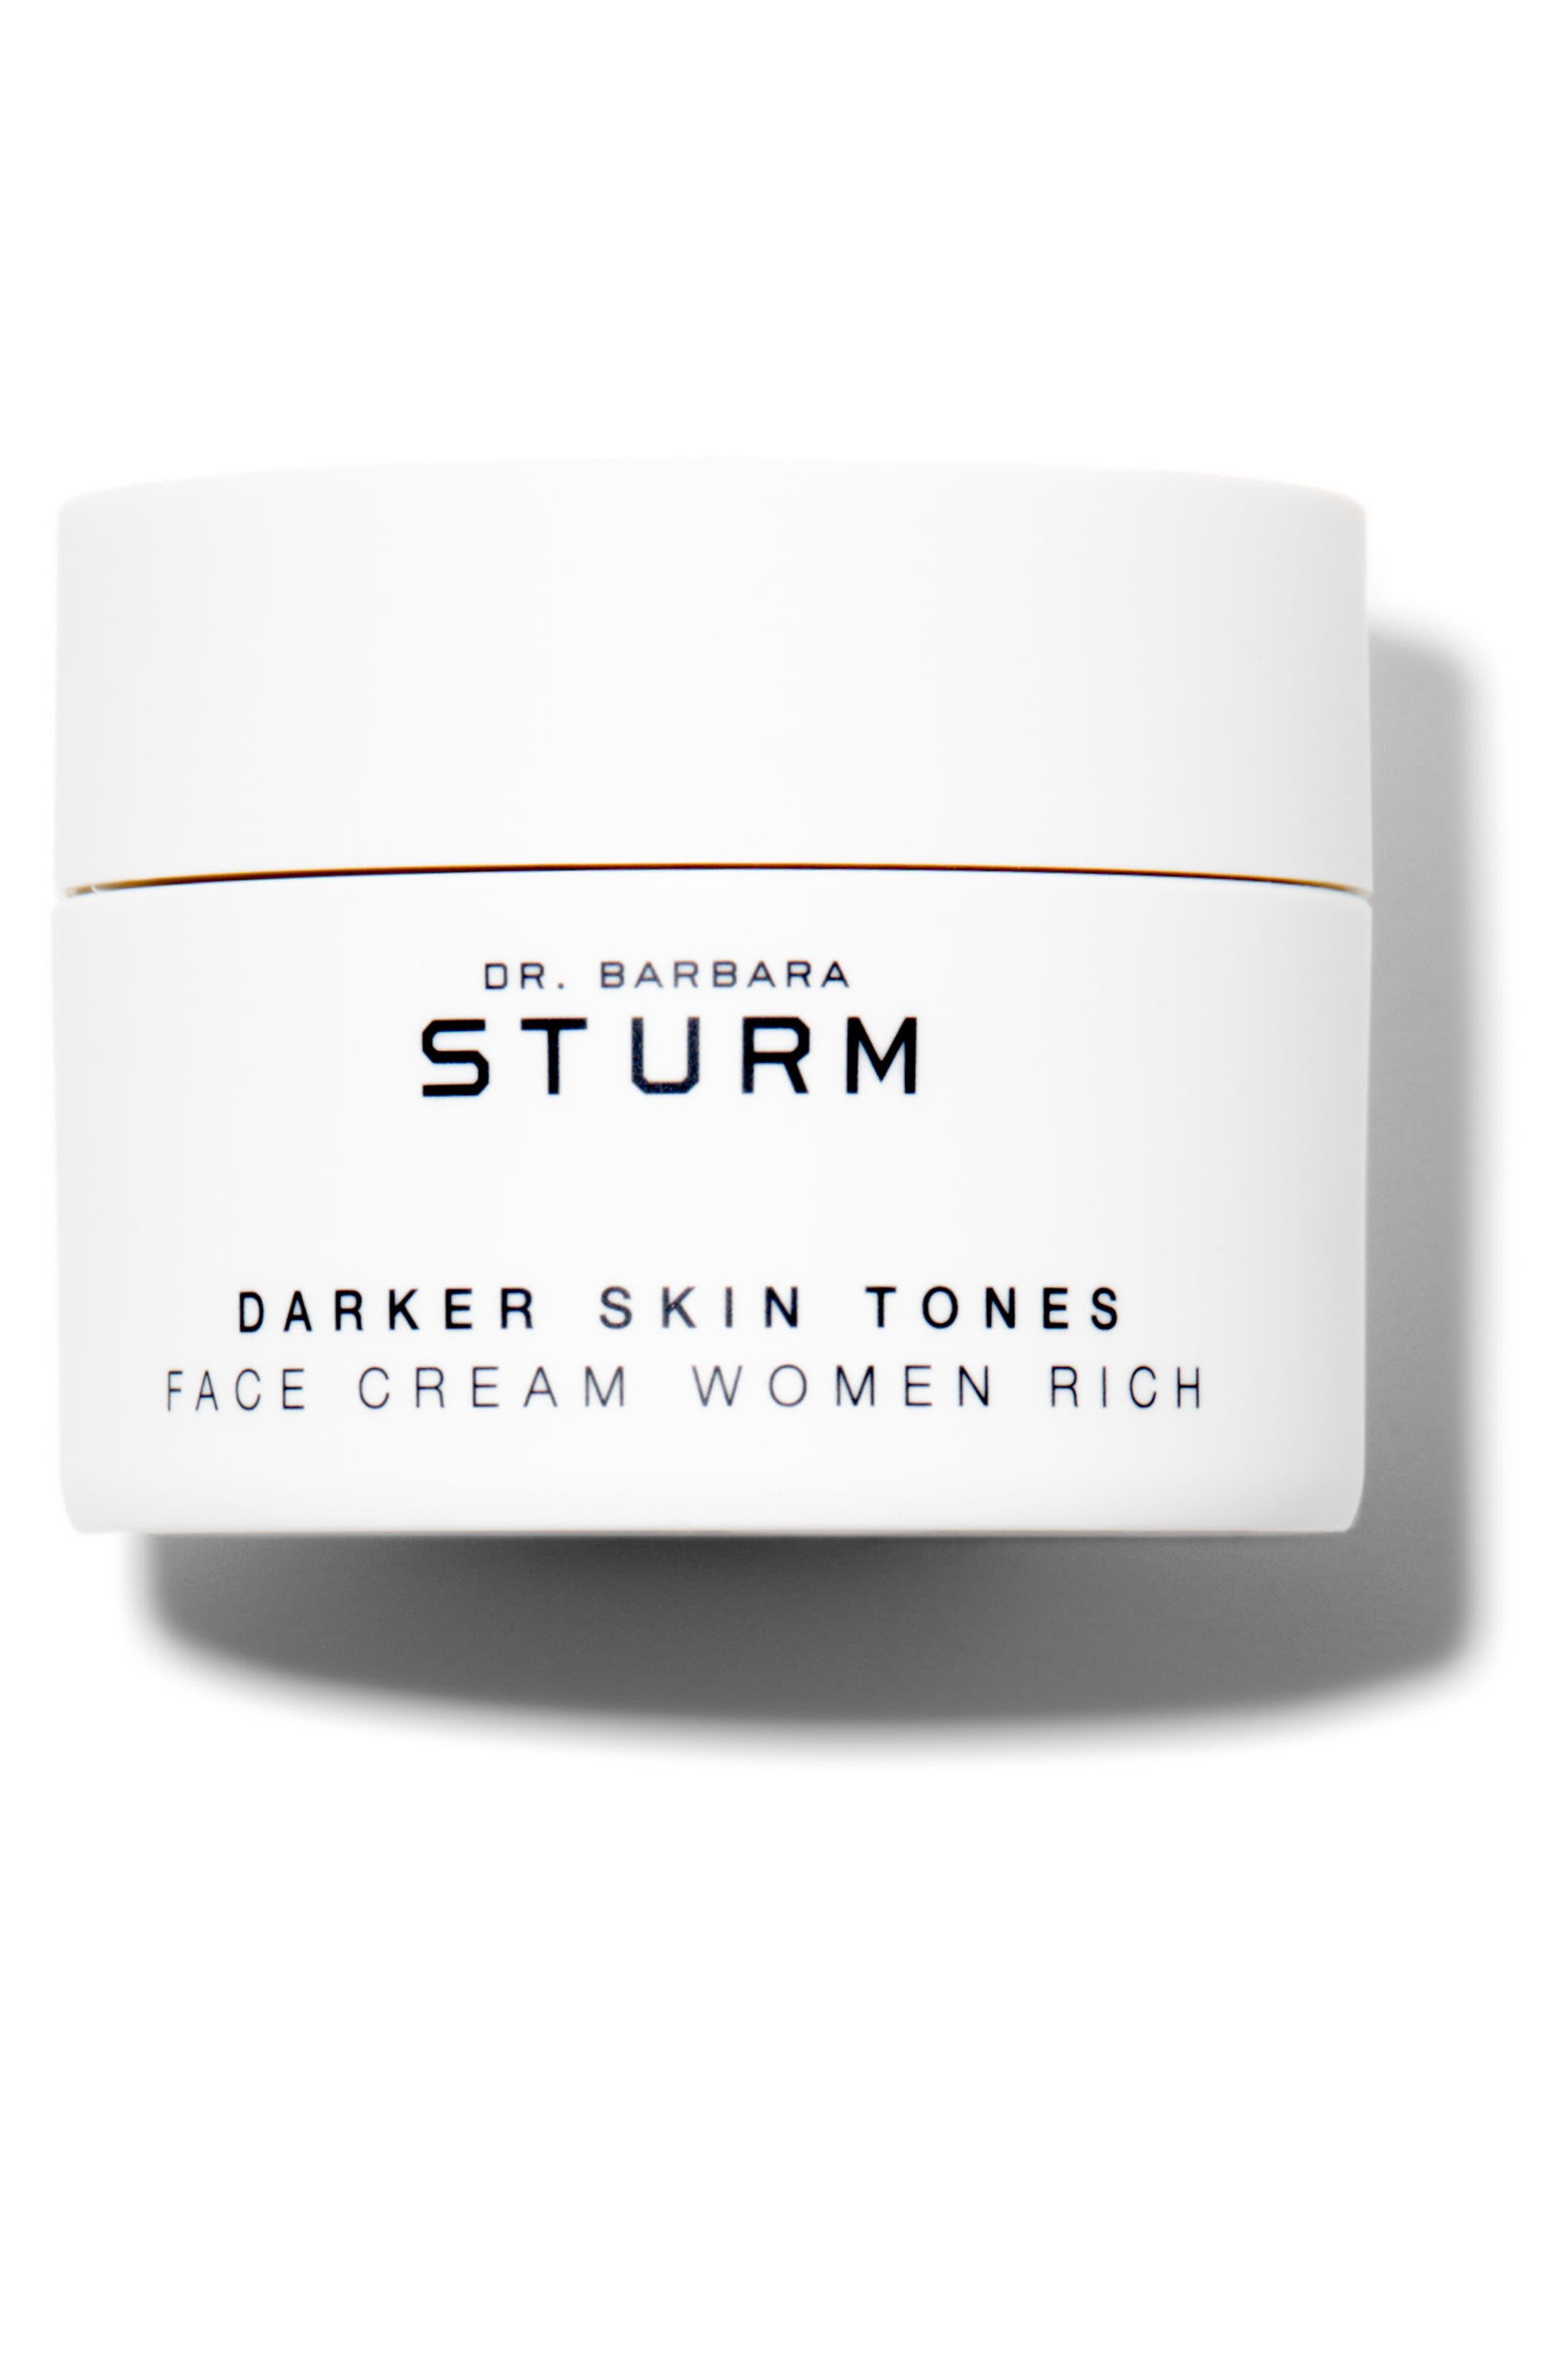 Darker Skin Tones Face Cream Rich,                             Main thumbnail 1, color,                             NO COLOR